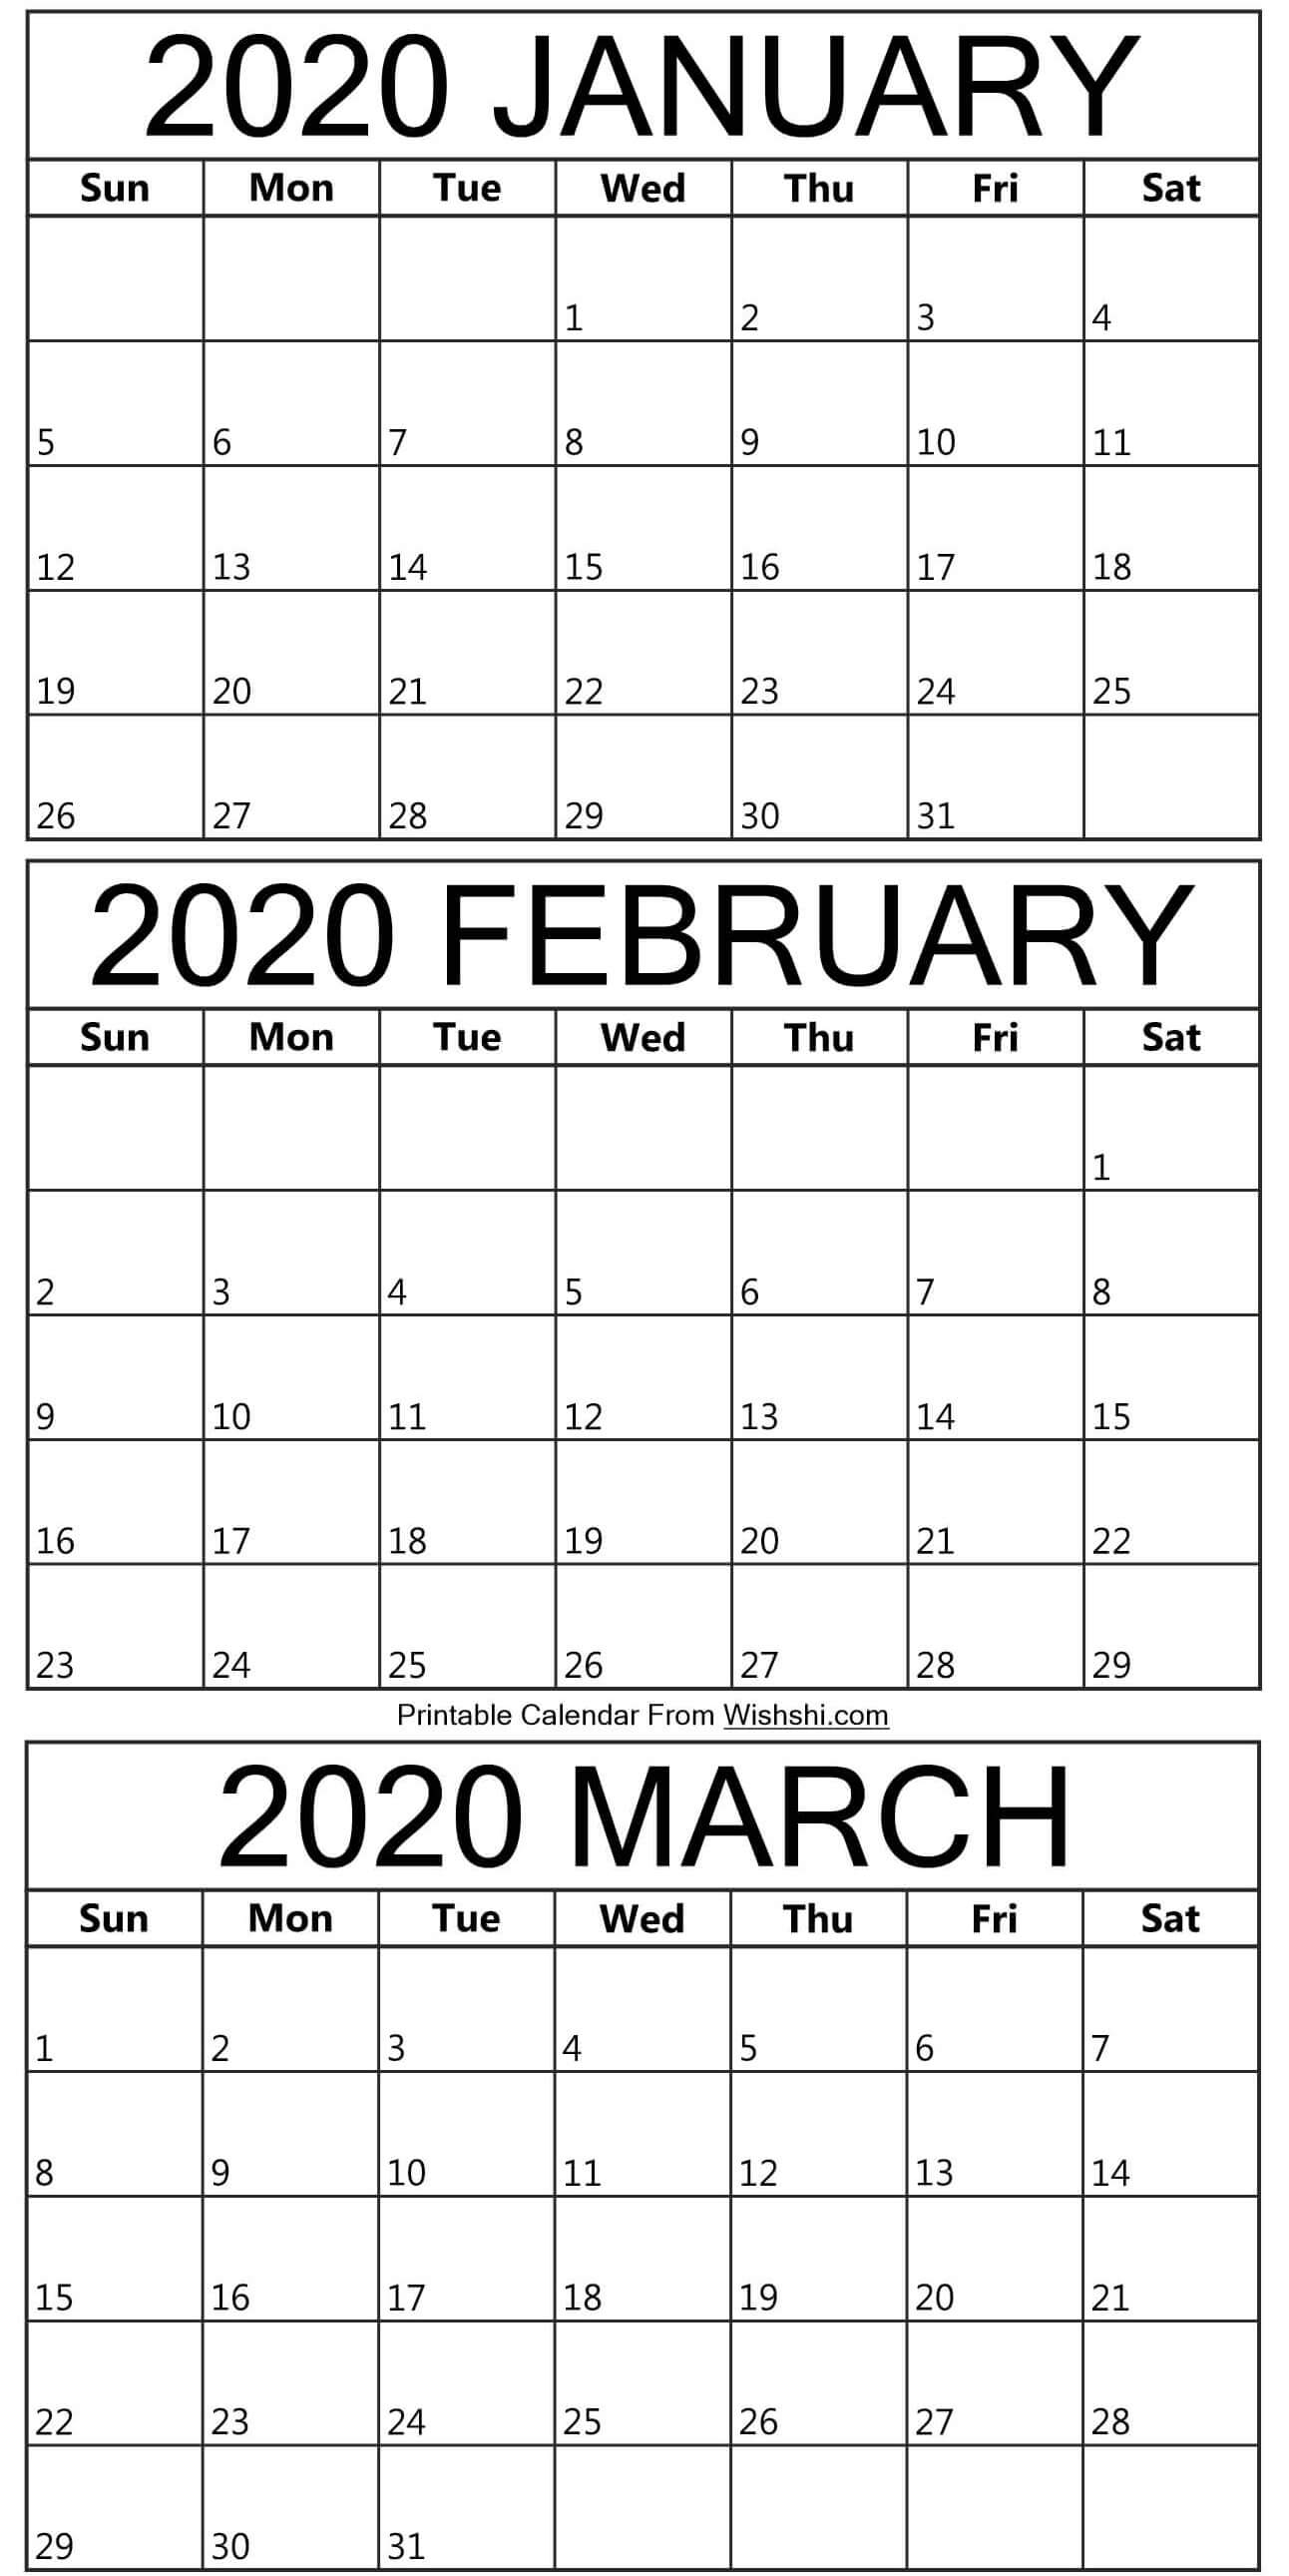 Printable January To March Calendar 2020 - Free Printable